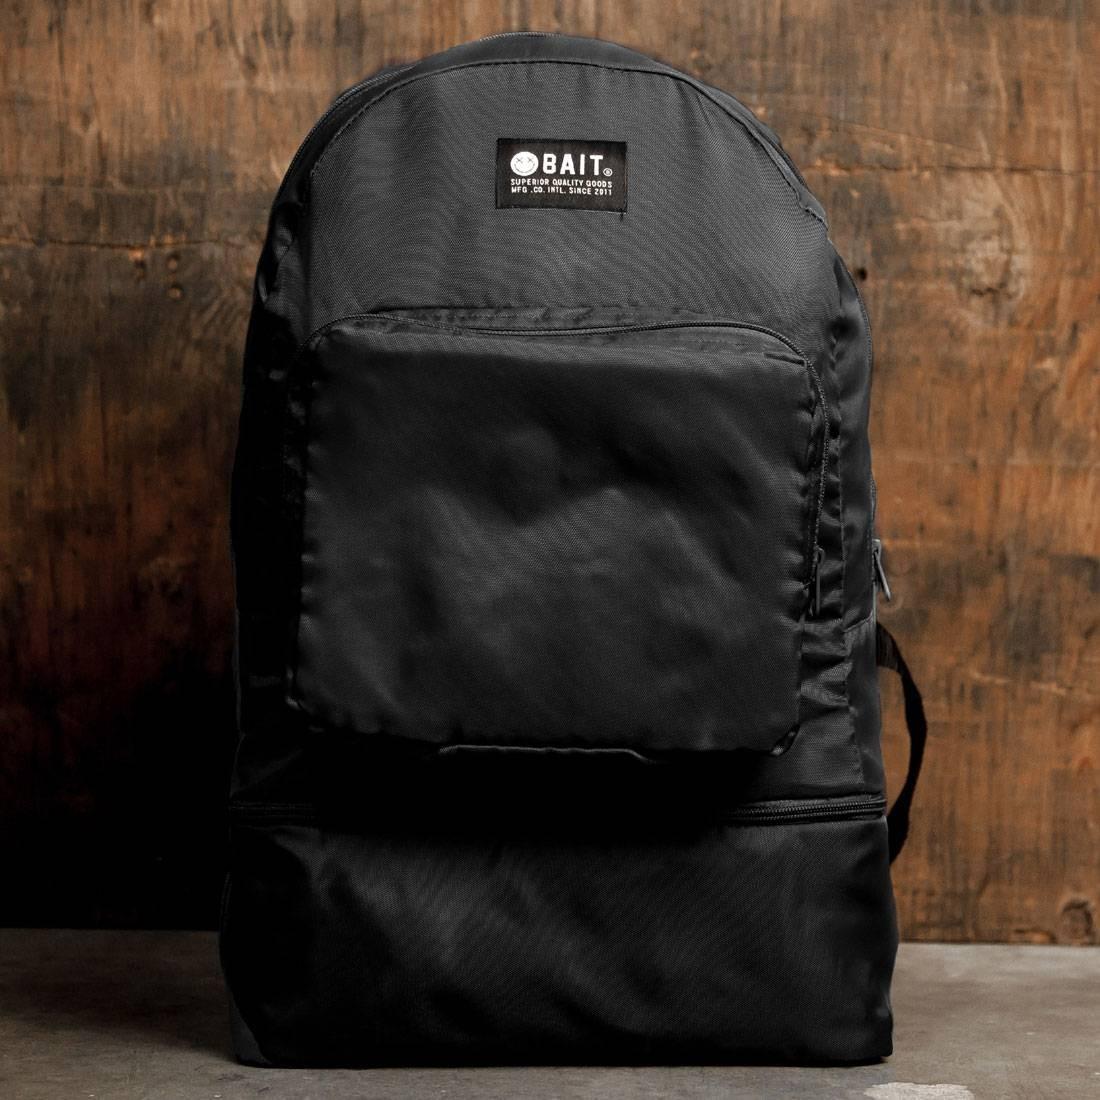 BAIT Lightweight Packable And Detachable Sneaker Nylon Backpack (black)